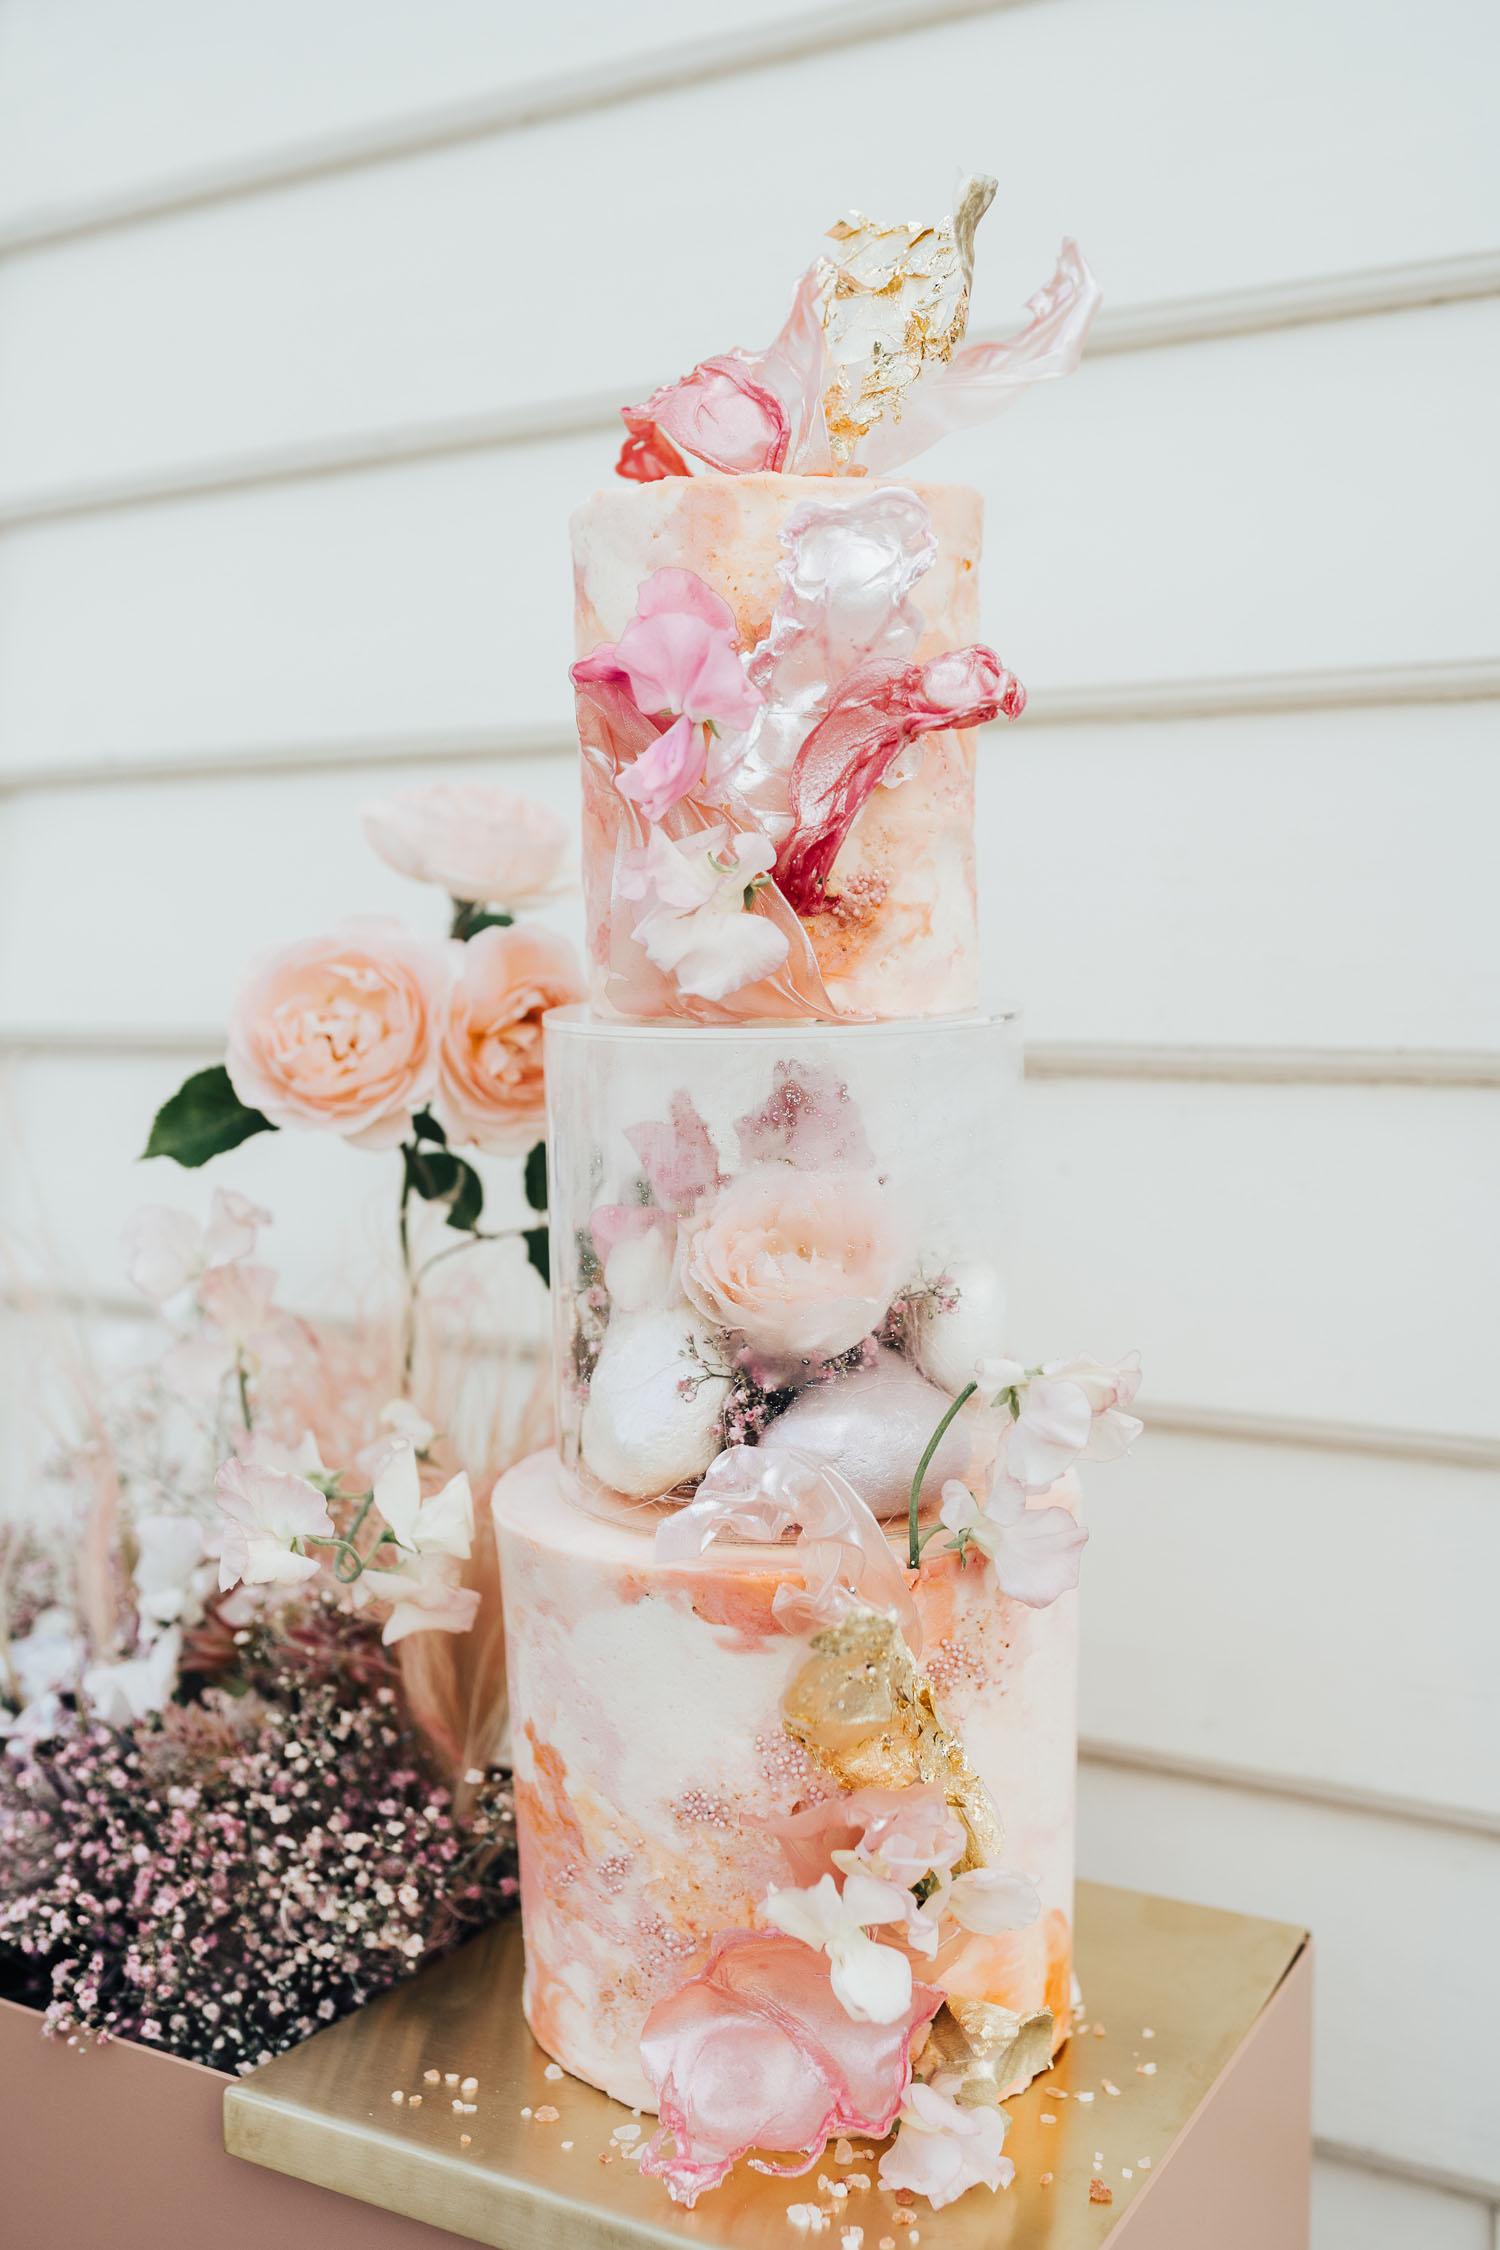 gâteau de mariage aquarelle